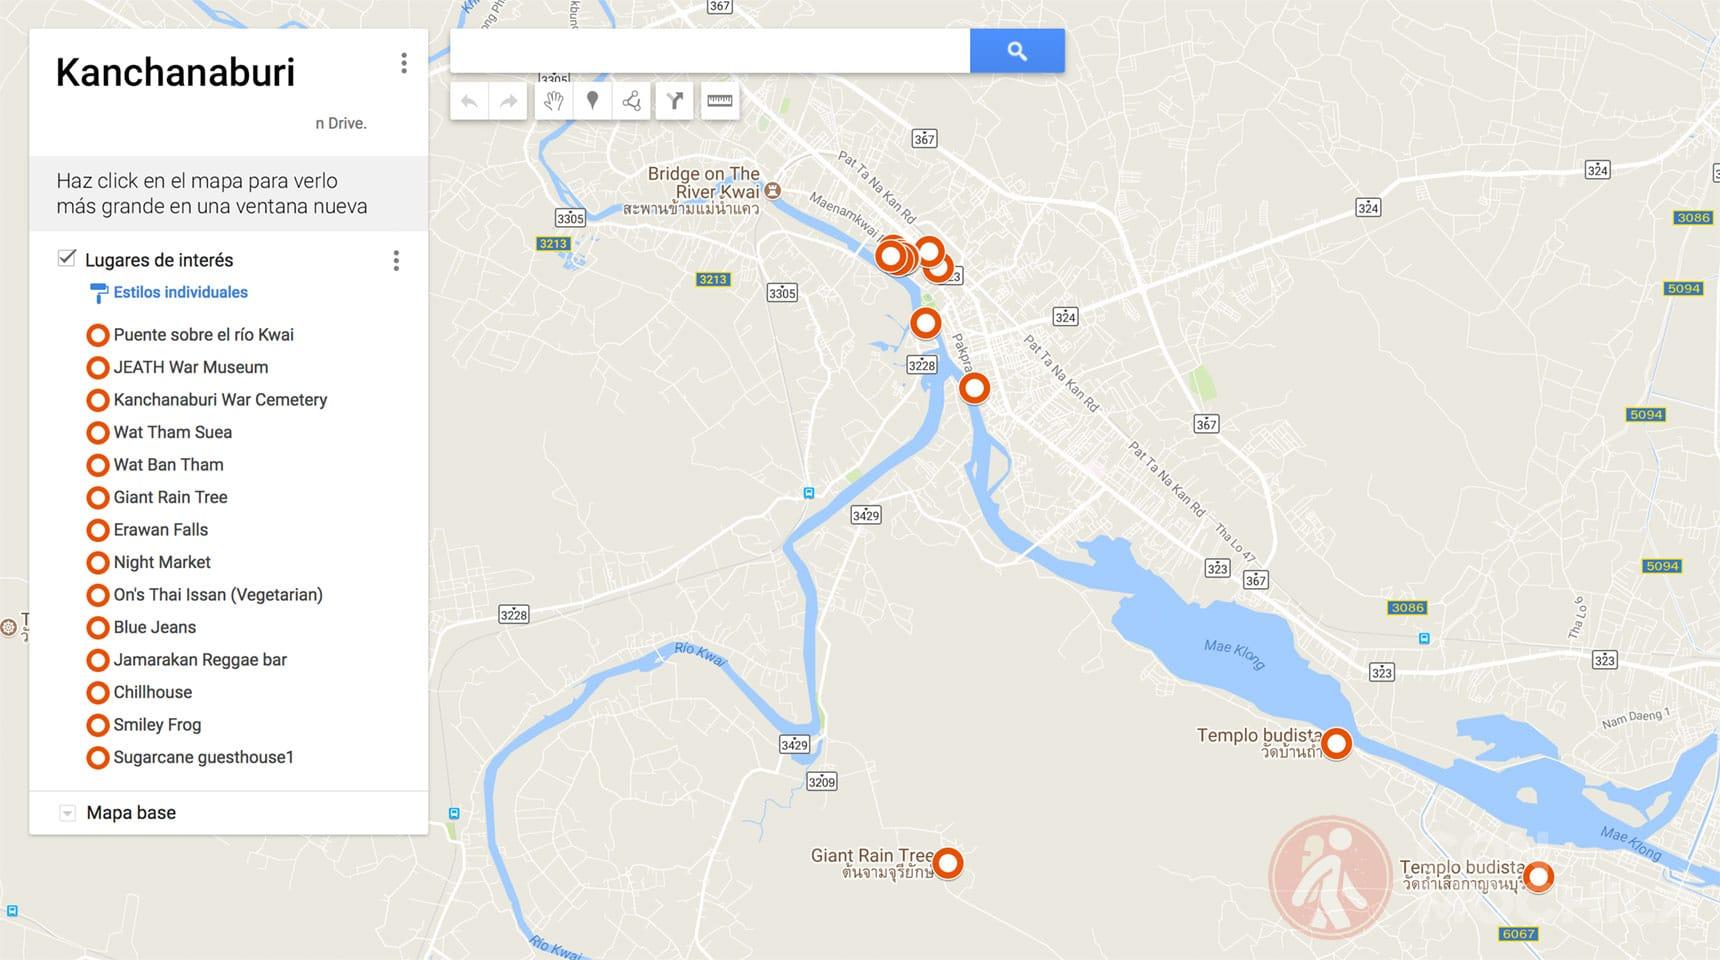 Mapa de Kanchanaburi